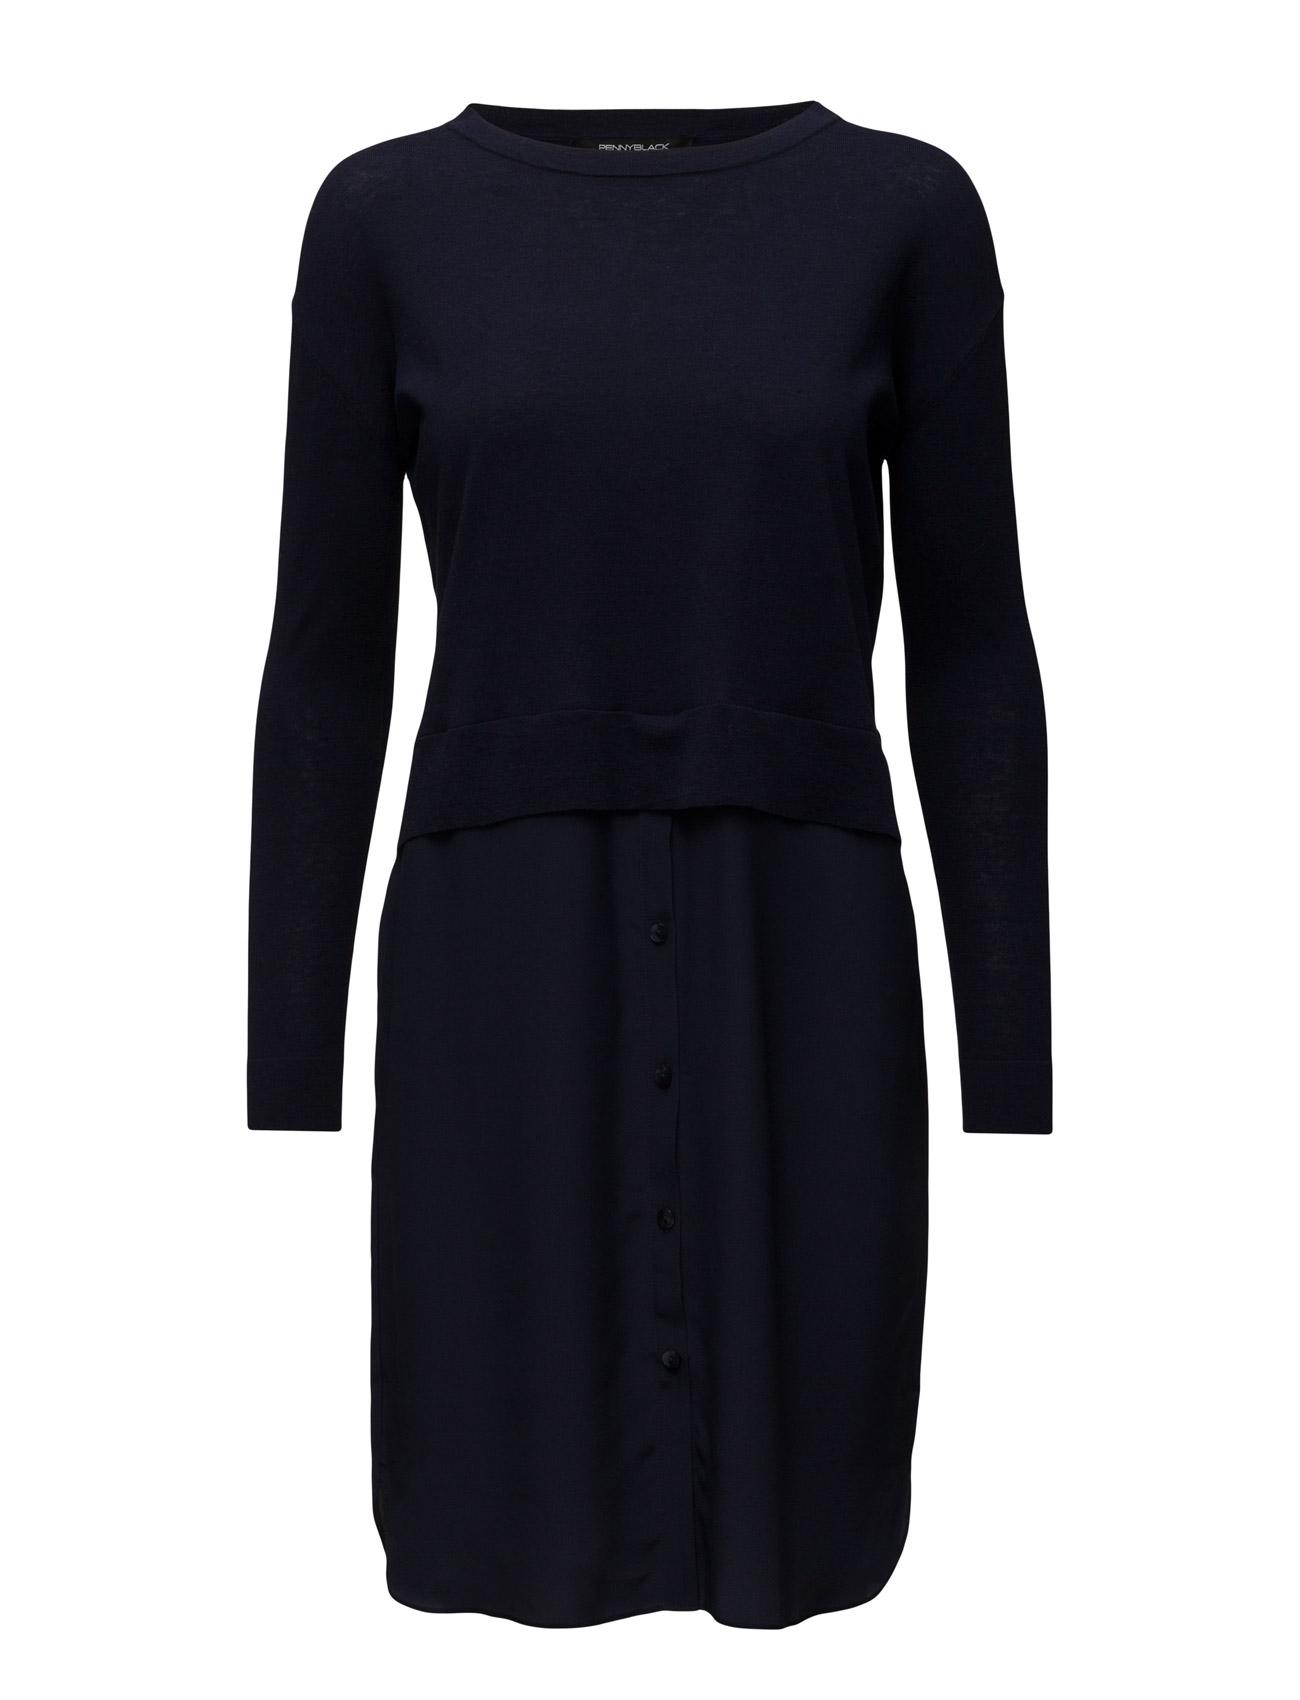 Odissea Pennyblack Korte kjoler til Kvinder i Antracit grå